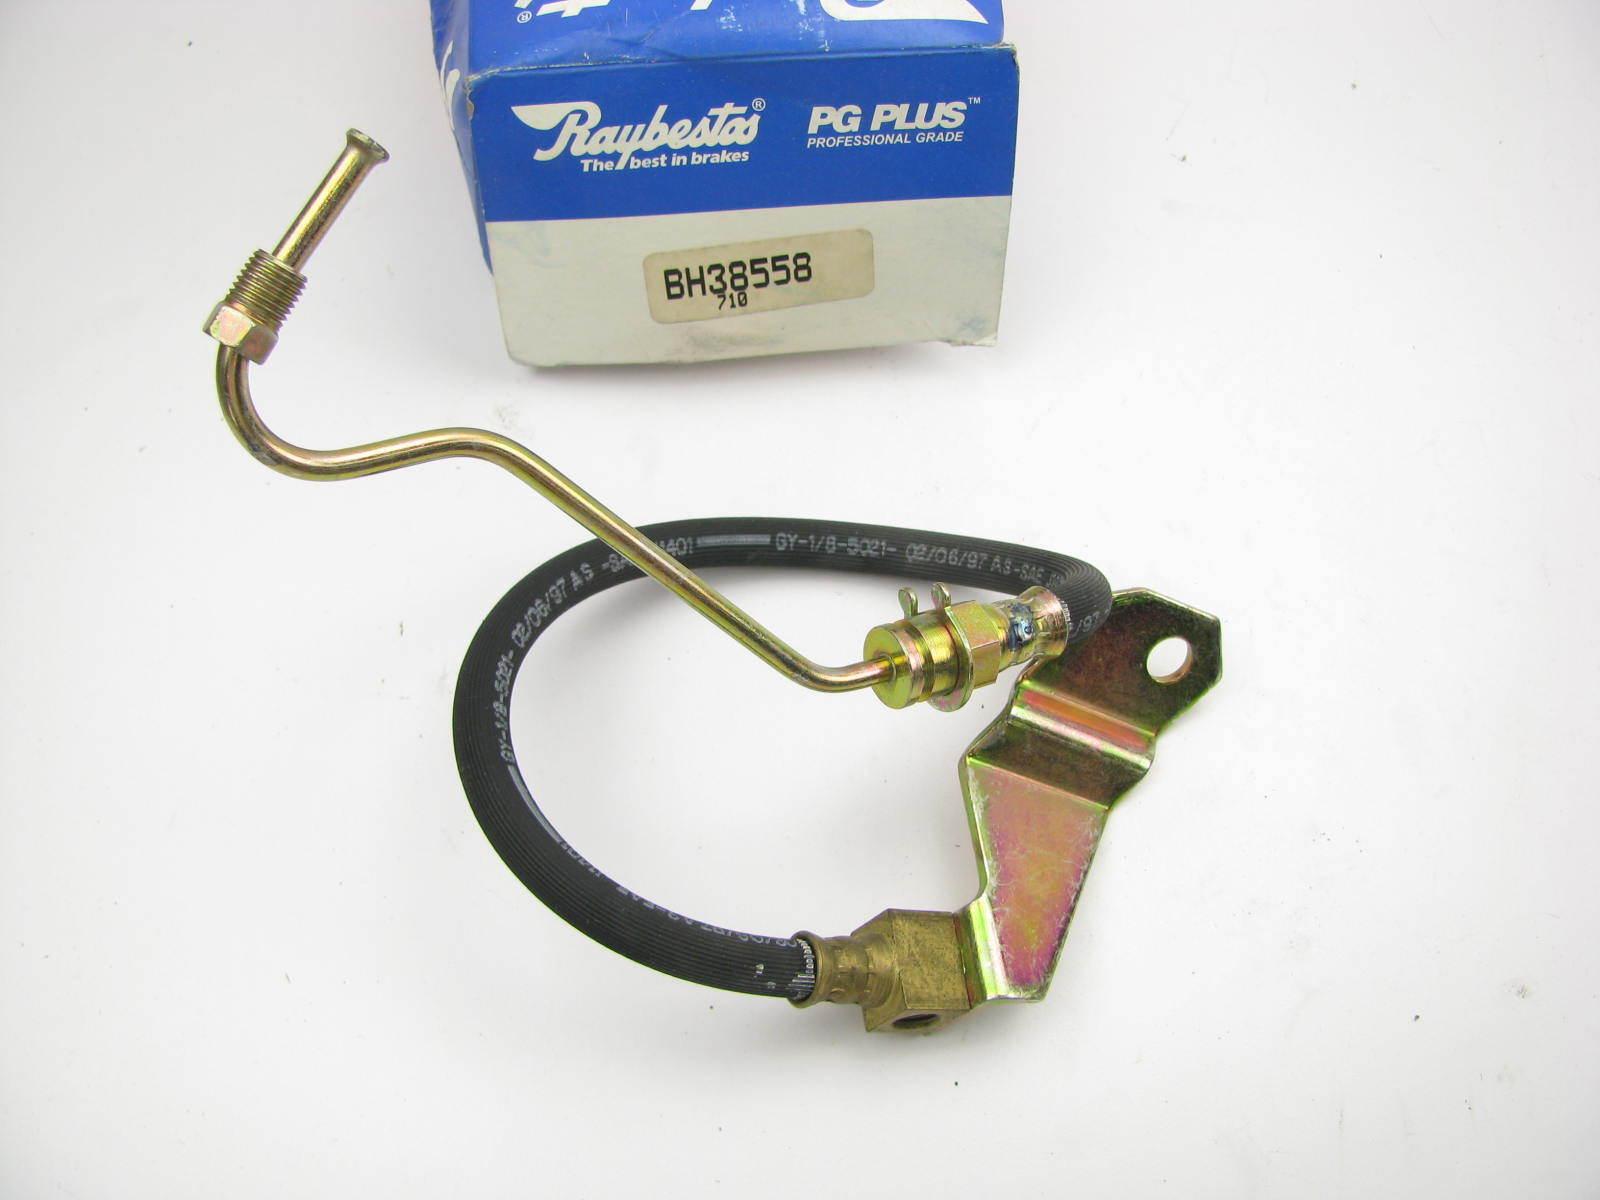 Raybestos BH38558 Professional Grade Brake Hydraulic Hose